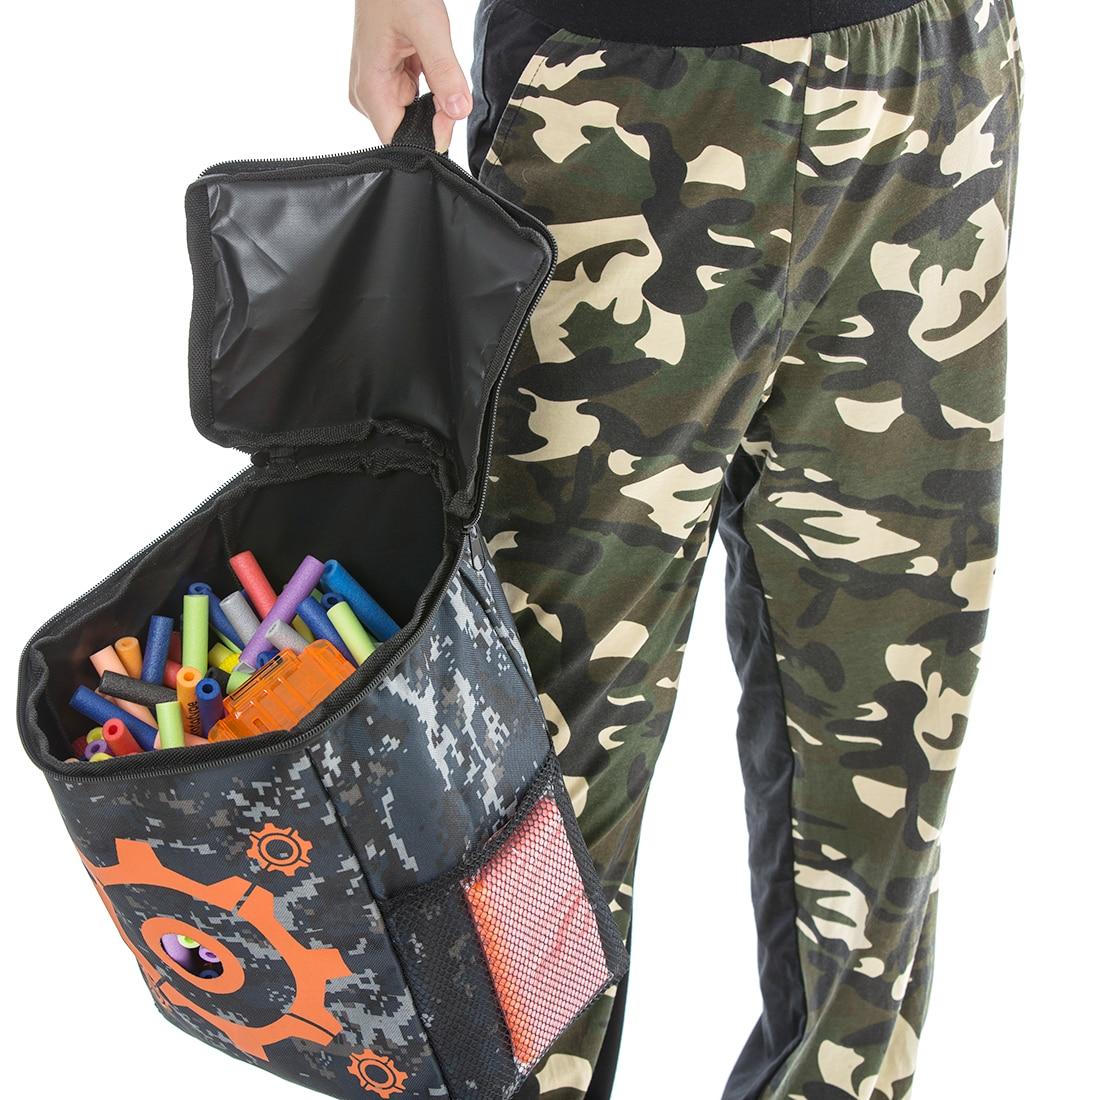 Organizer, Target, Practice, Pouch, Toys, Storage